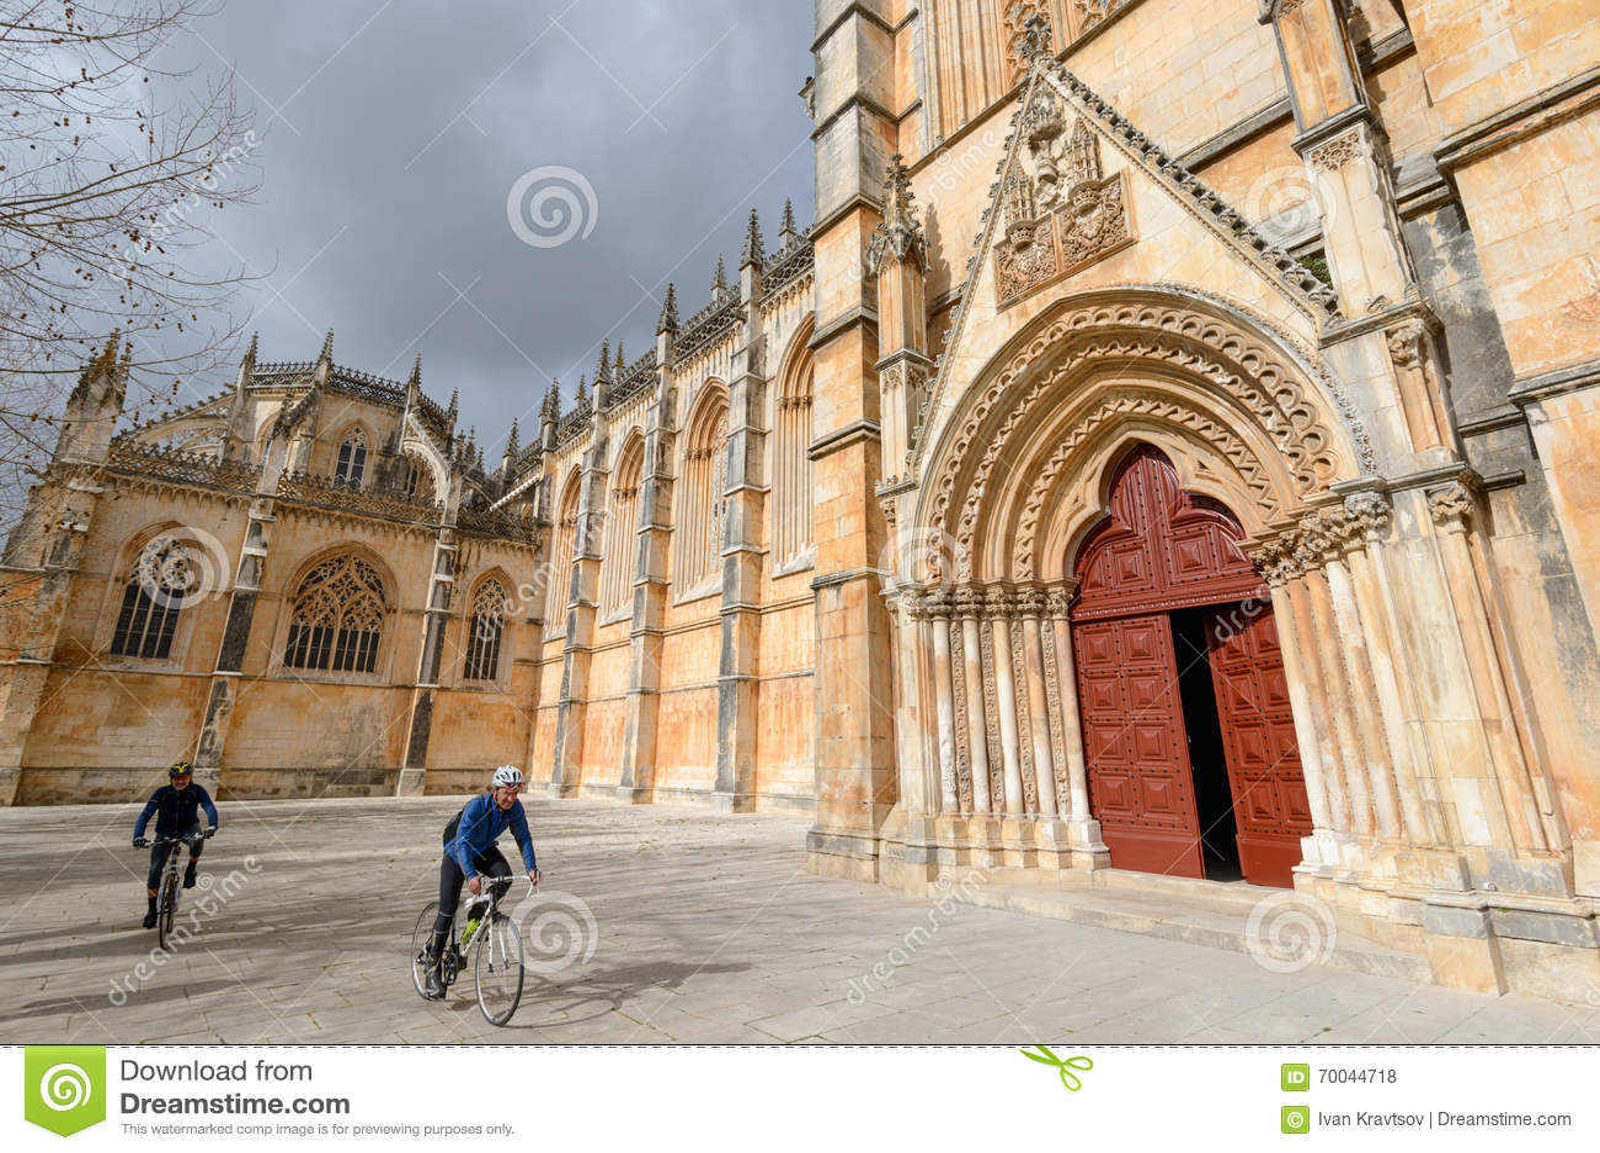 Batalha, Portugal - February 07, 2016: Two bikers riding near th